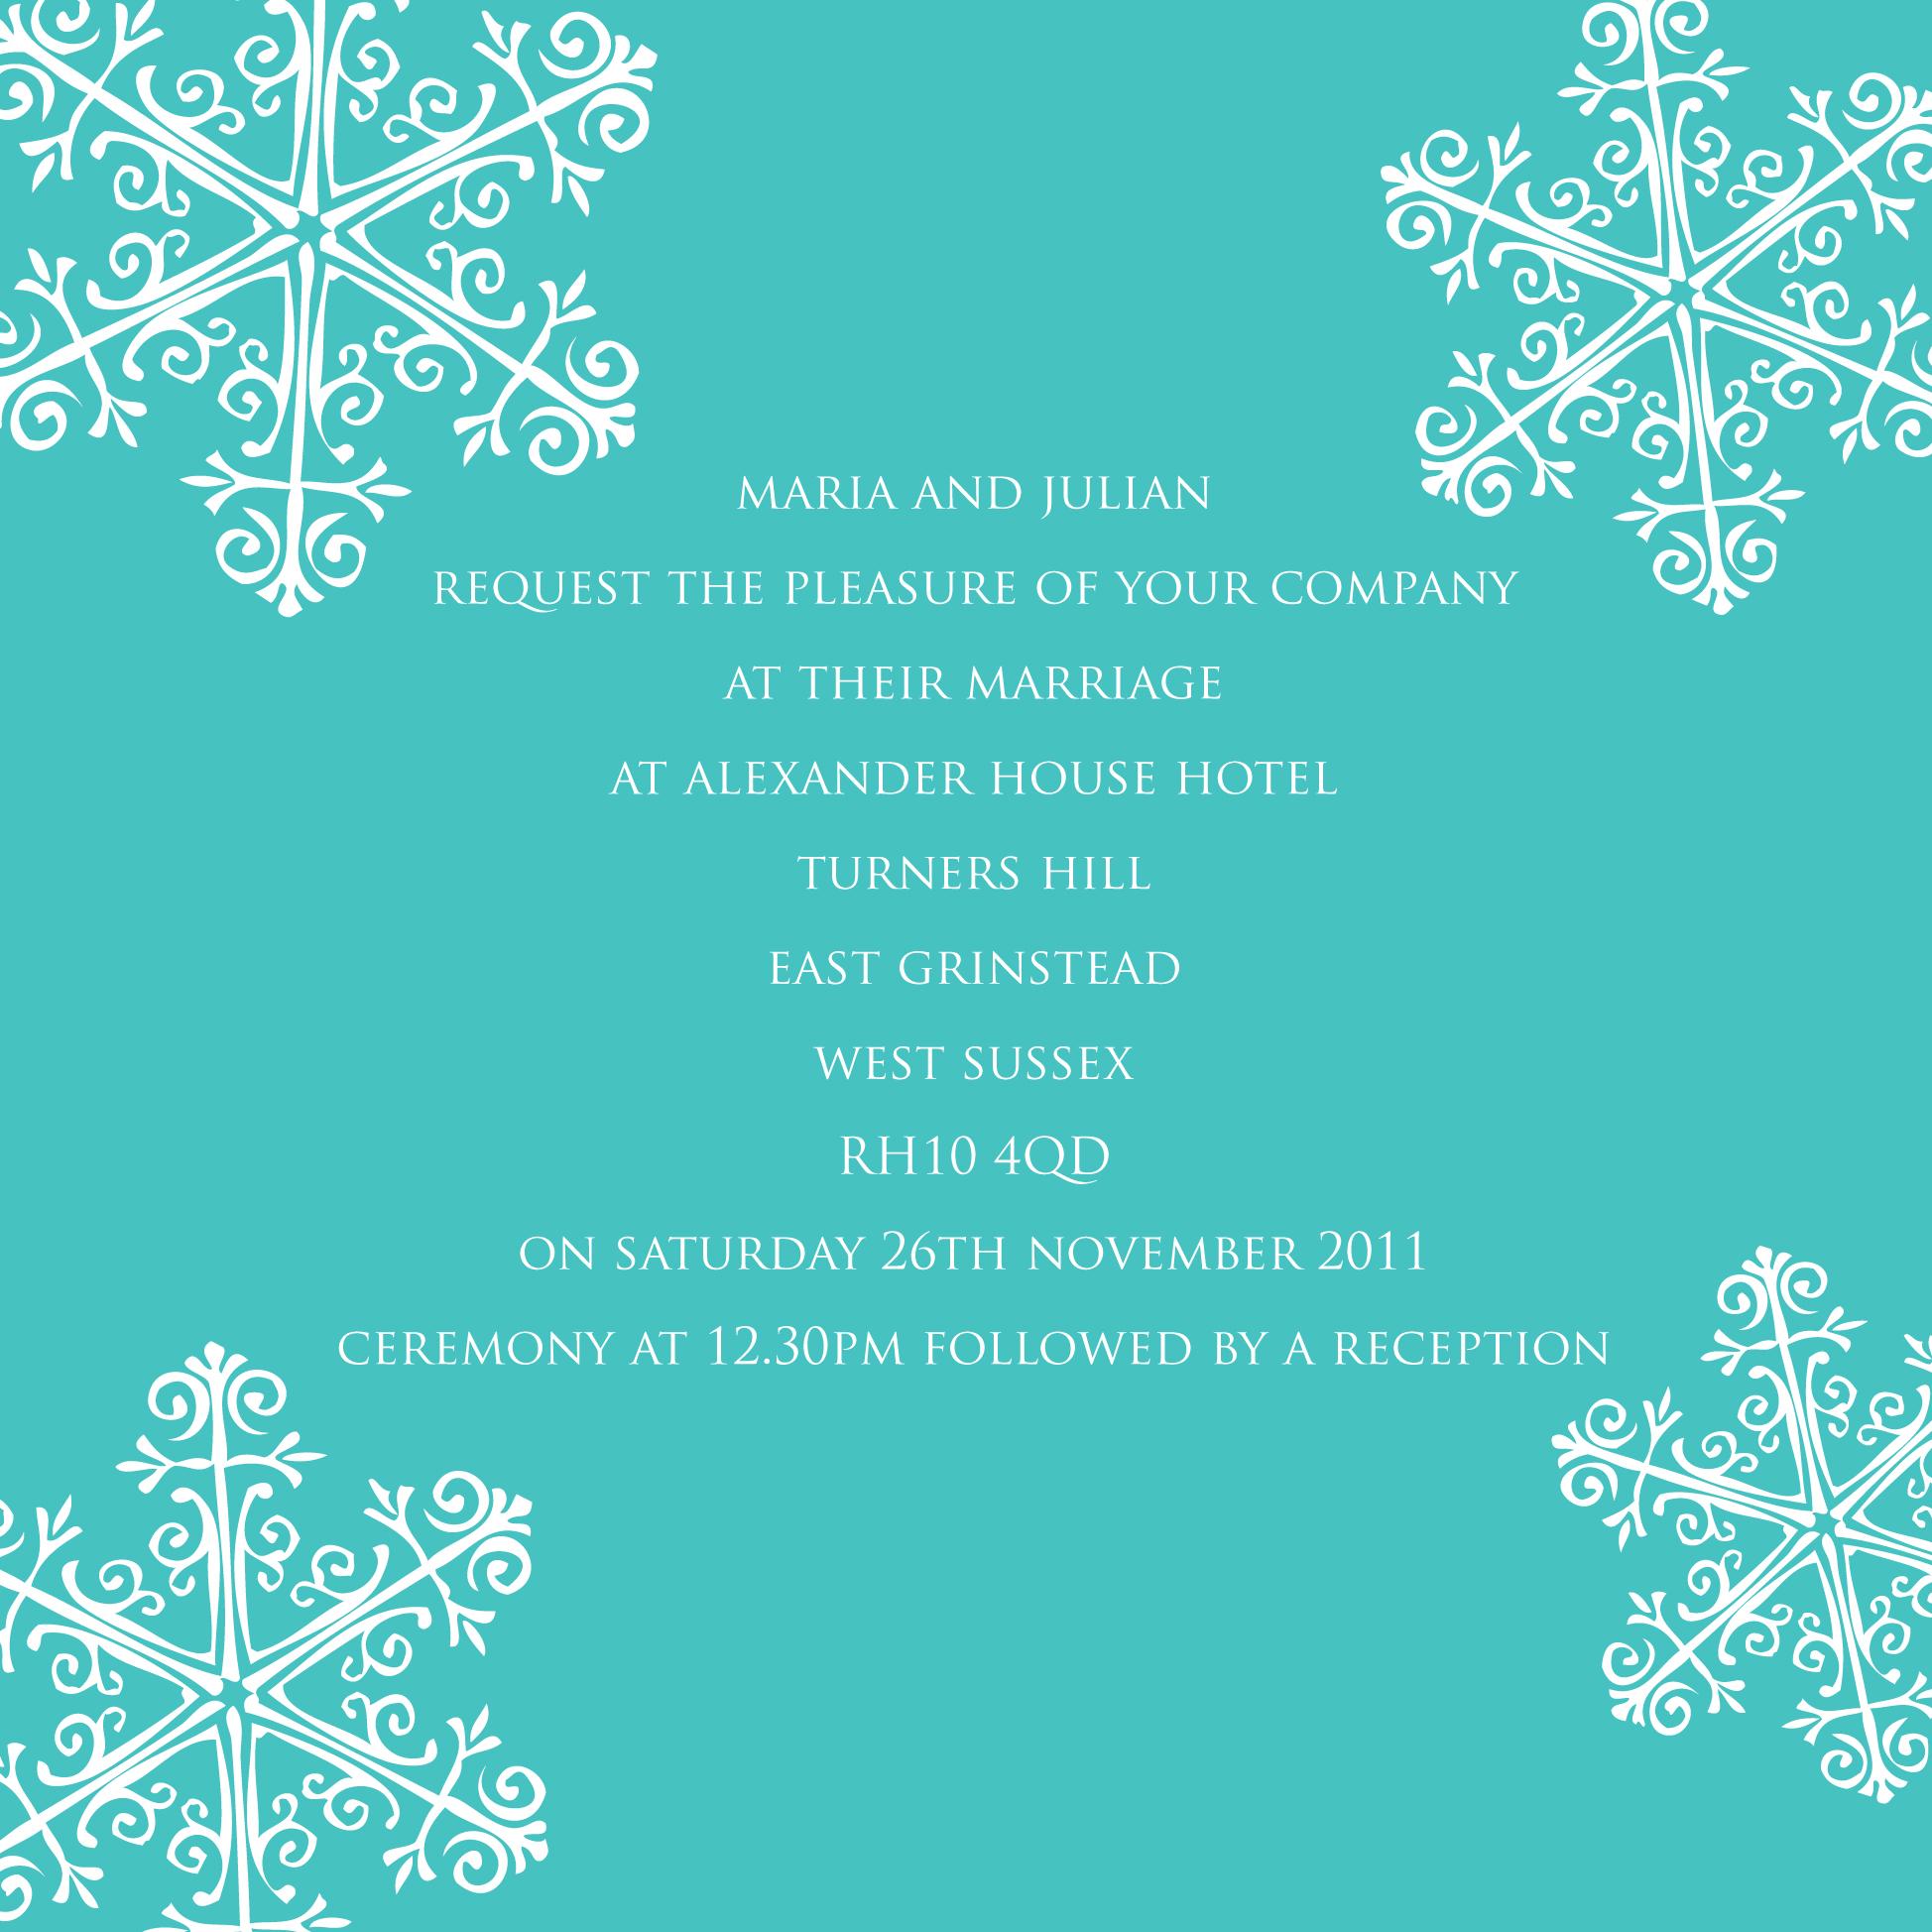 Winter Wonderland invitation by Ananya